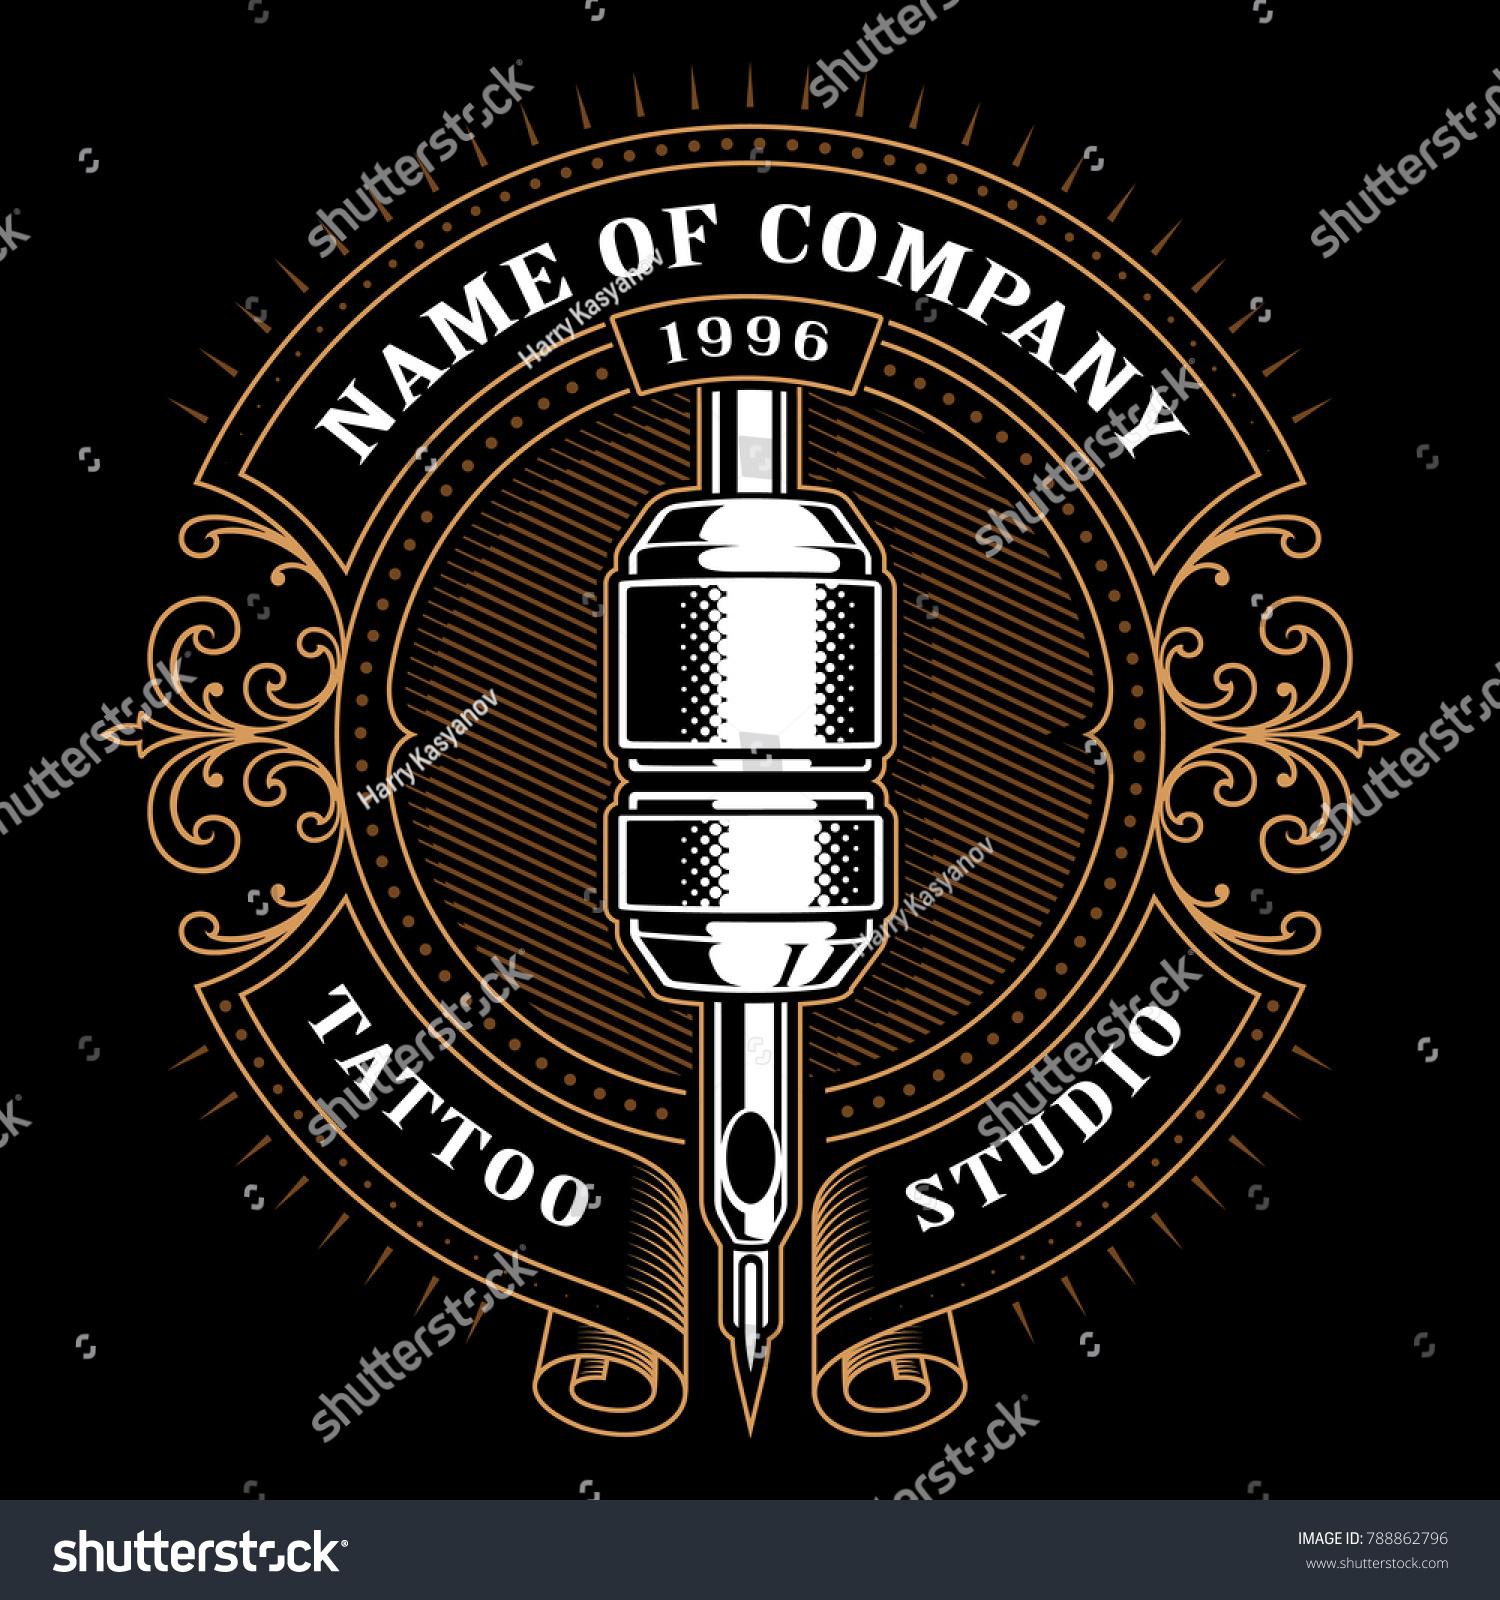 Royalty free stock illustration of tattoo studio logo template.